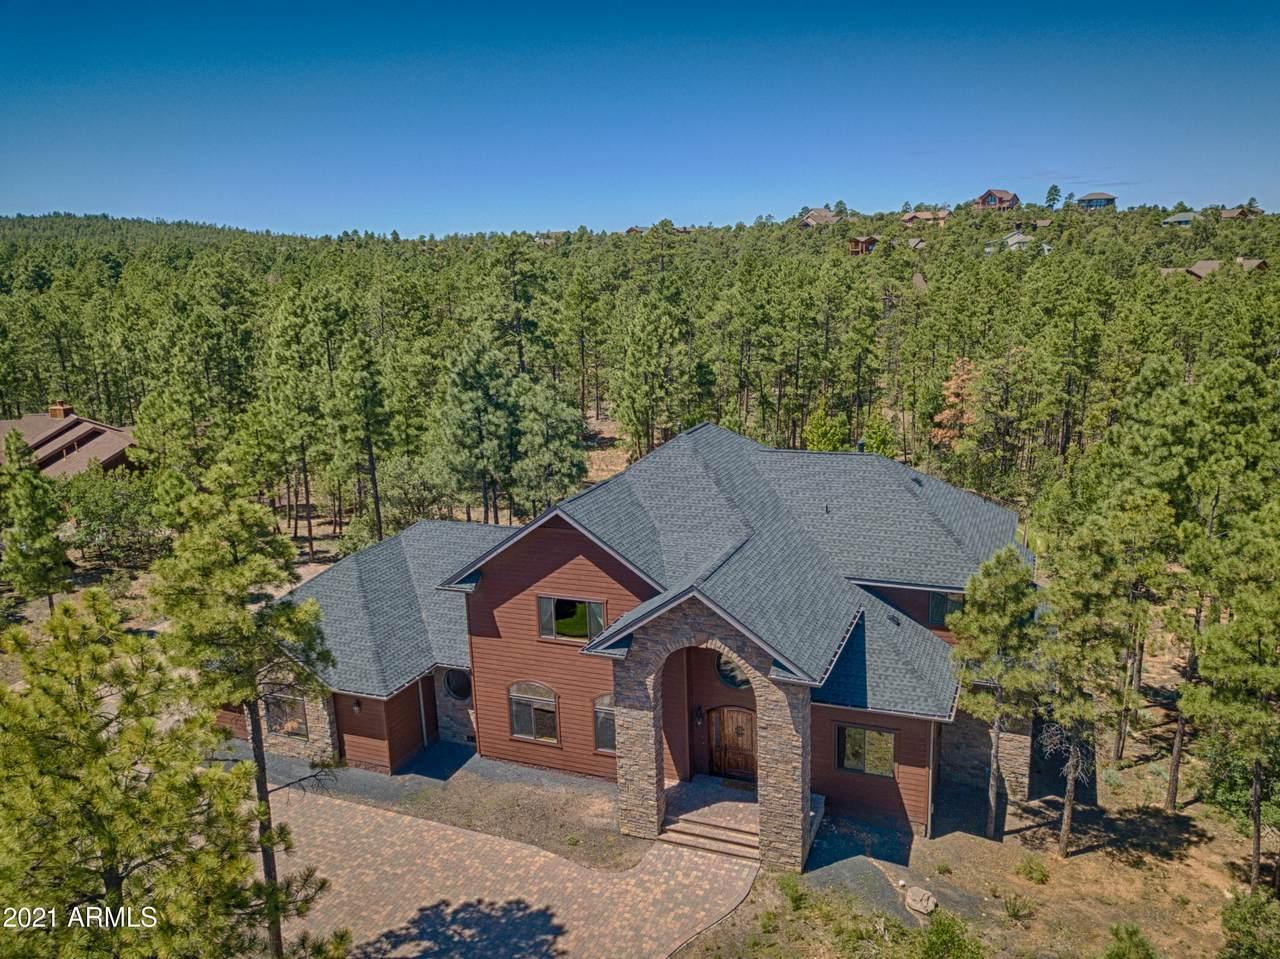 1700 Sierra Pines Circle - Photo 1